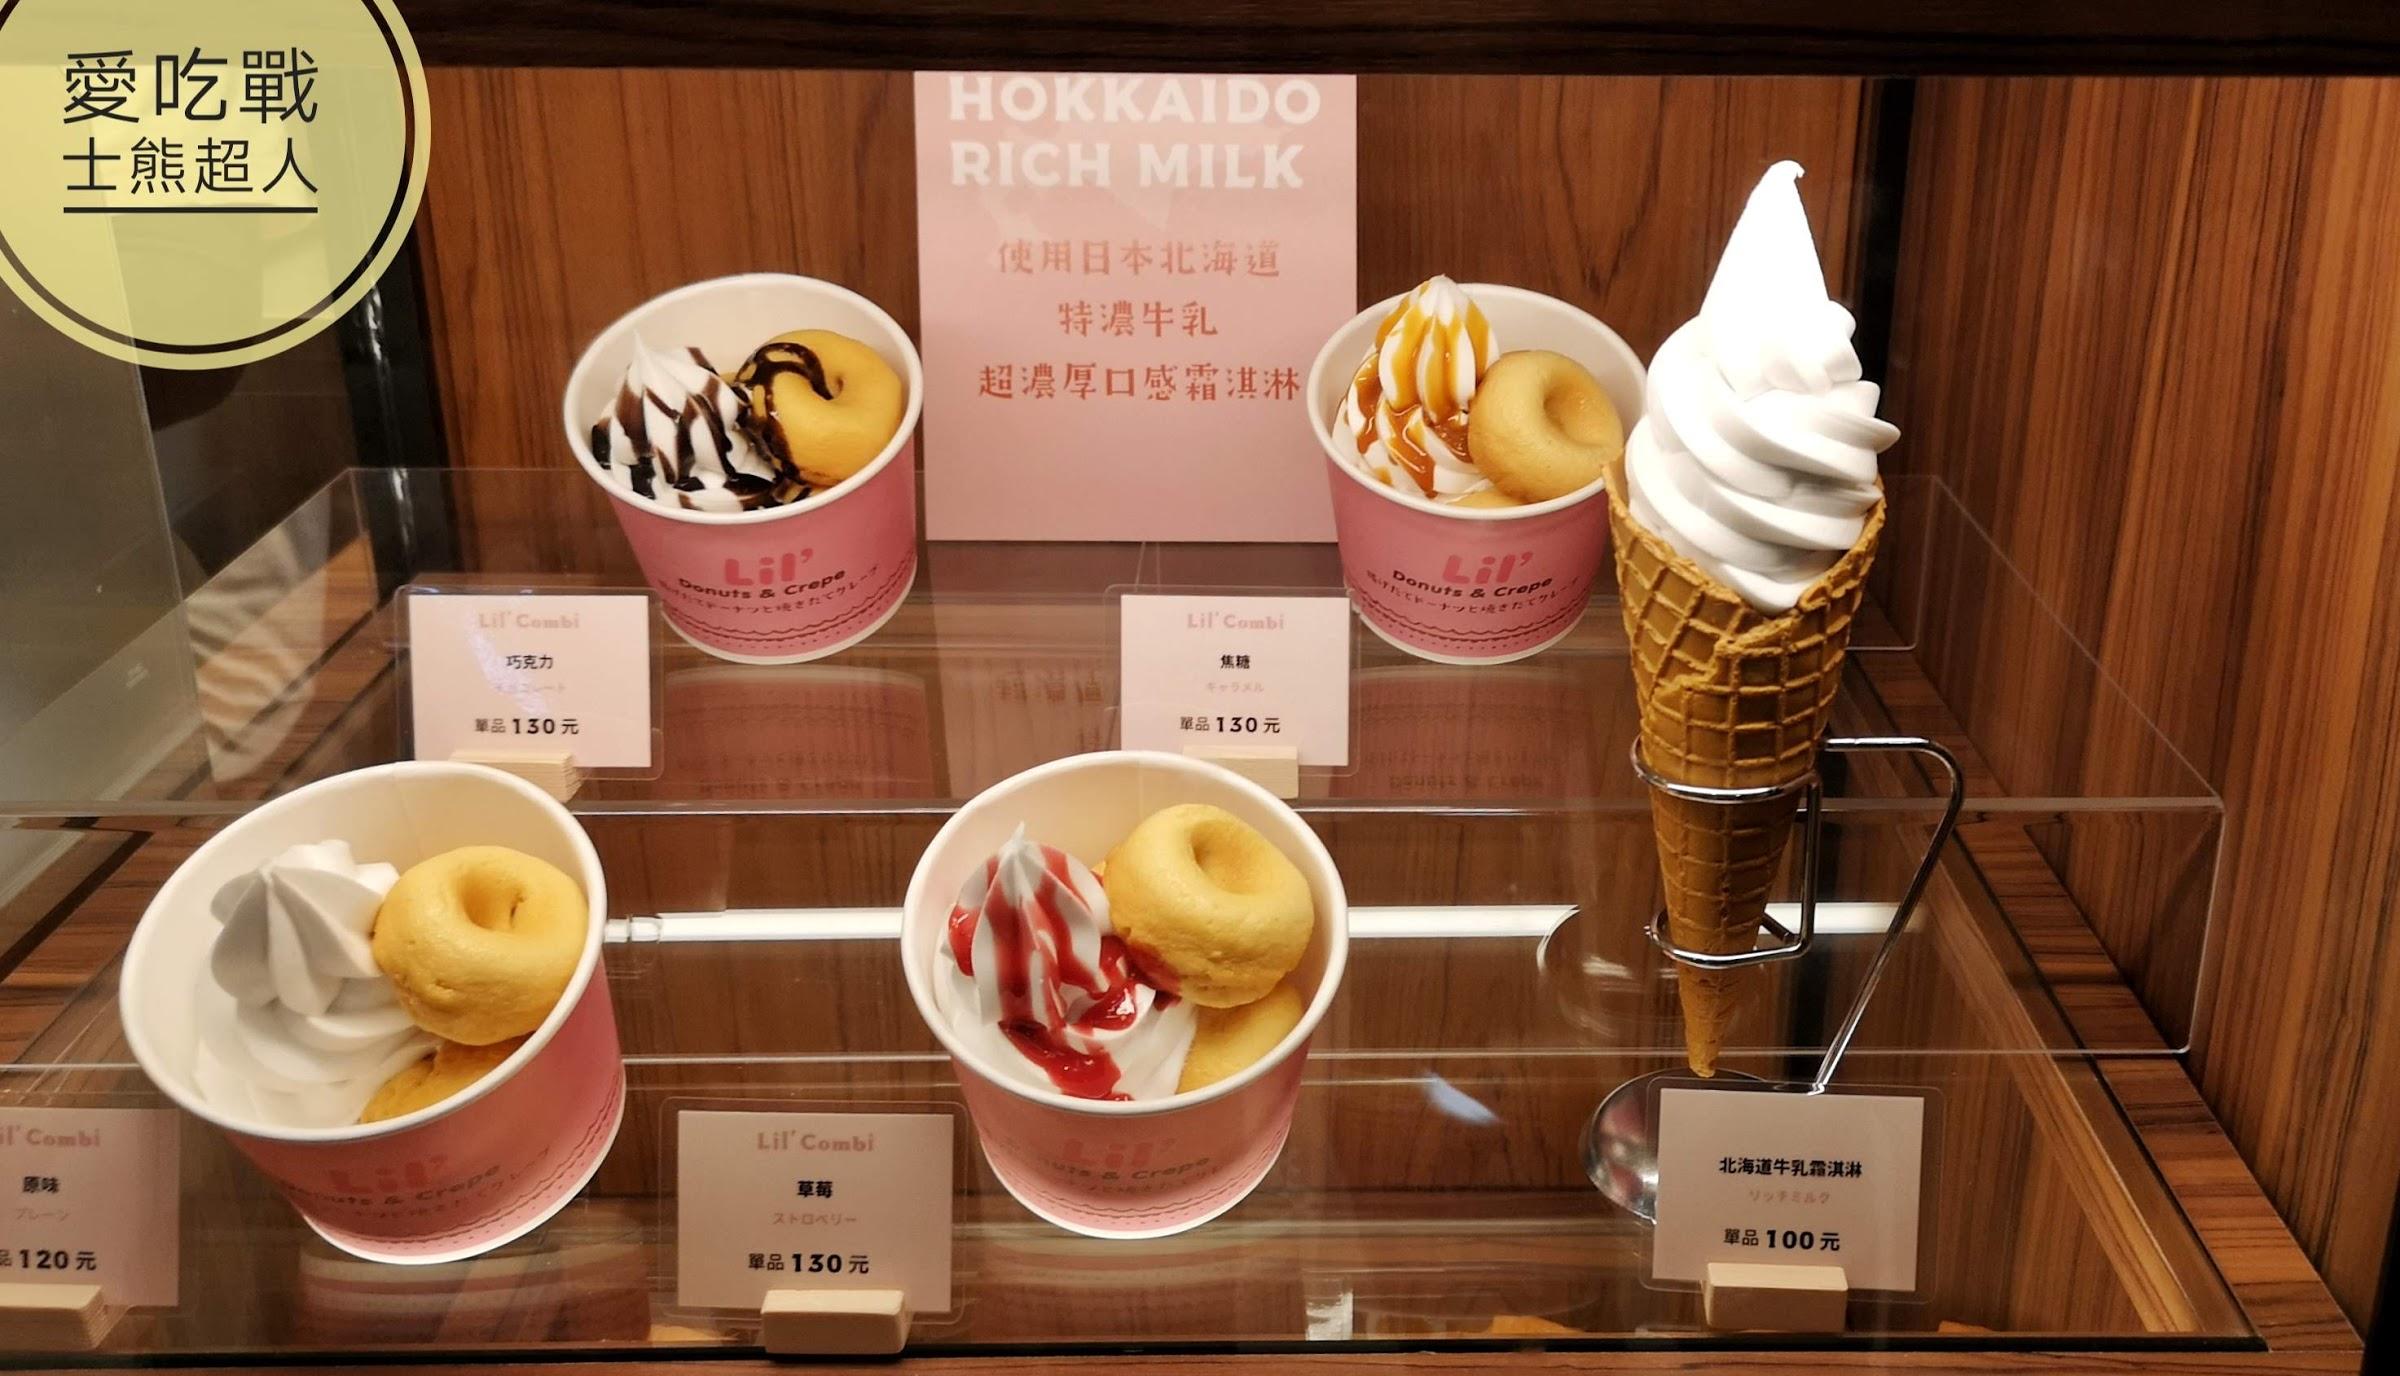 Lil' Donuts & Crepe北海道甜甜圈